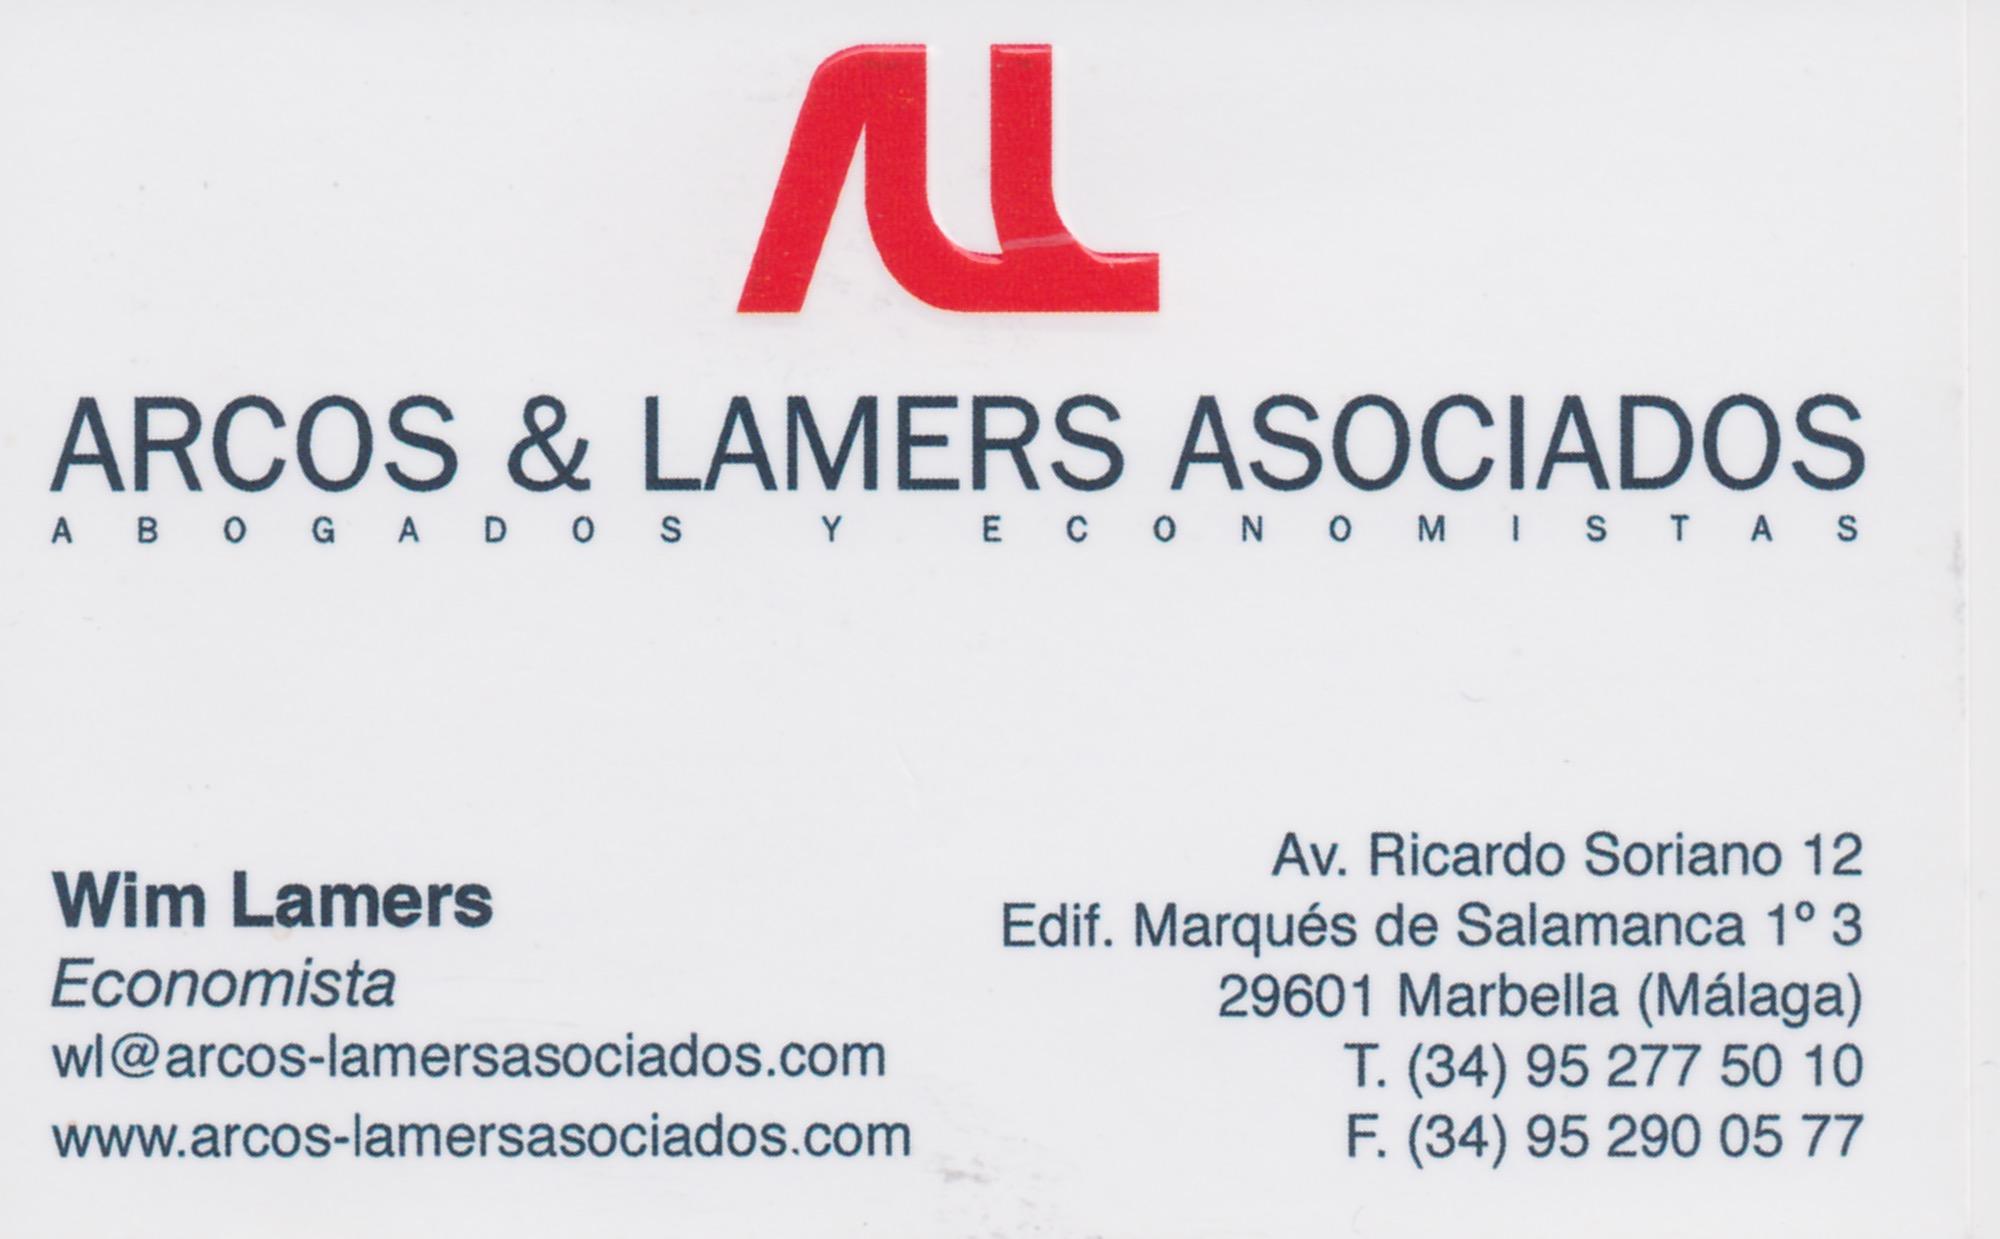 Arcos-wim lamers